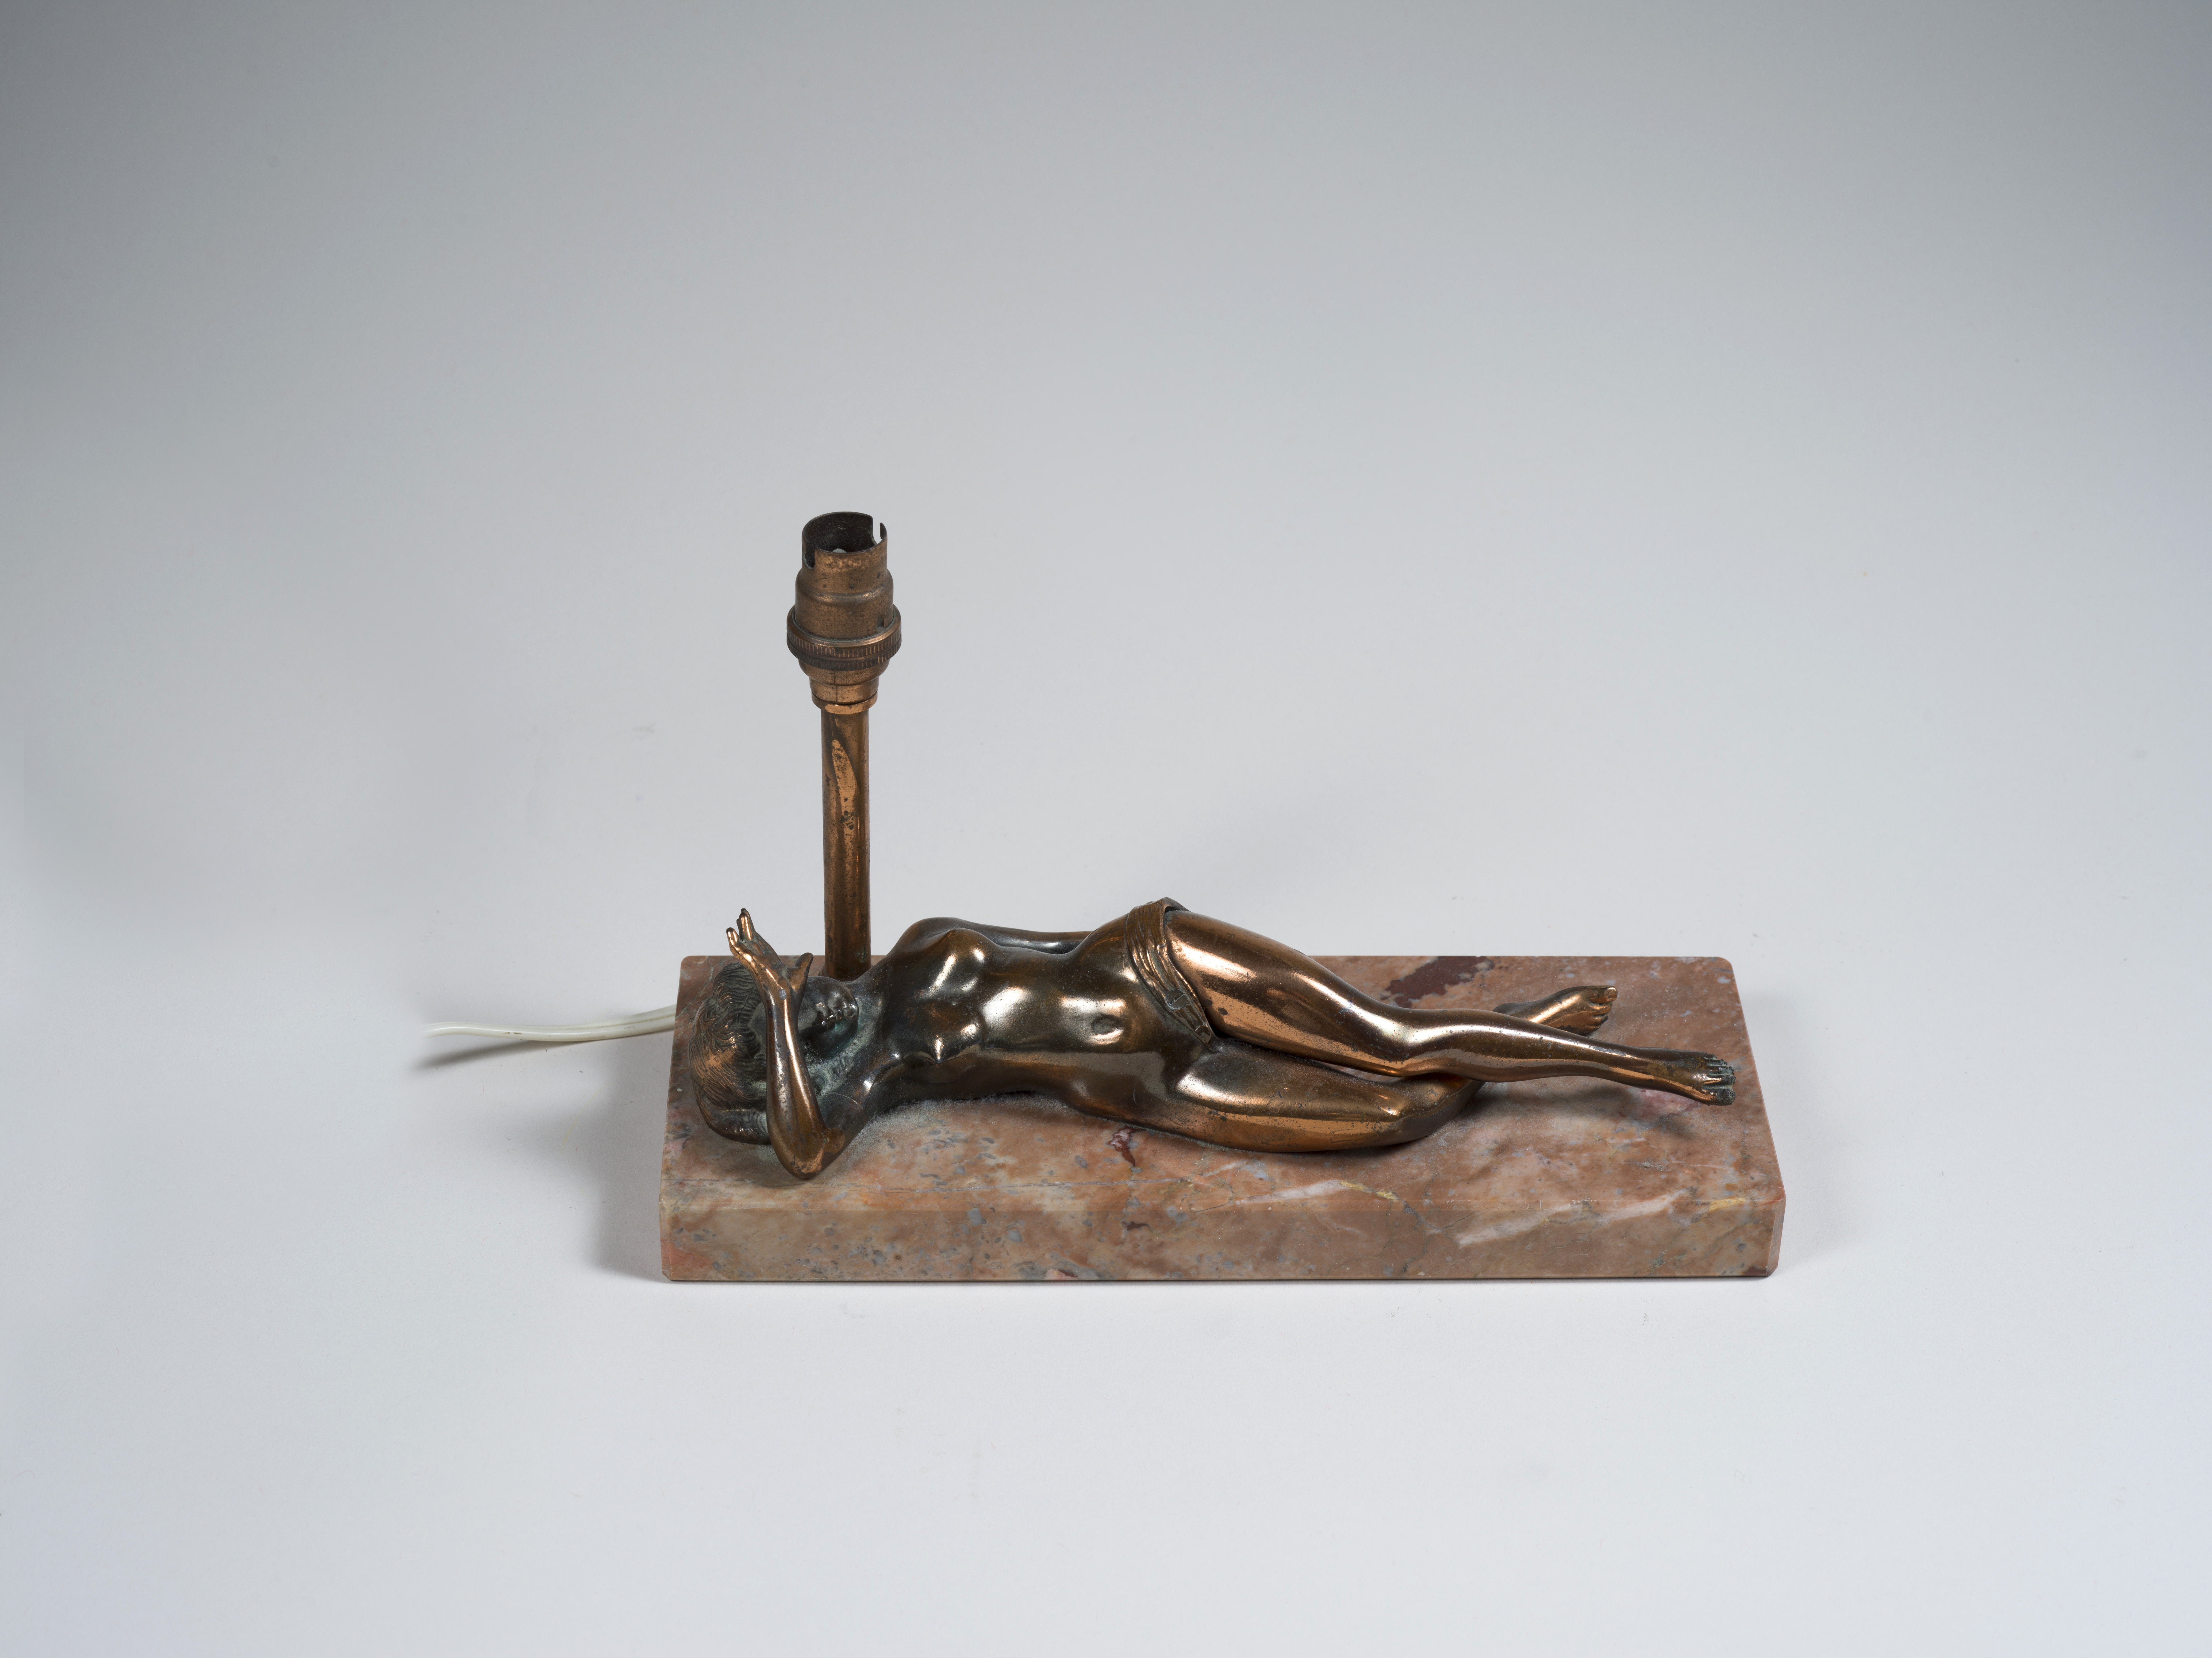 Lot 41 - Erotica - Lampe figurant une jeune femme nue allongée dissimulant son visage [...]